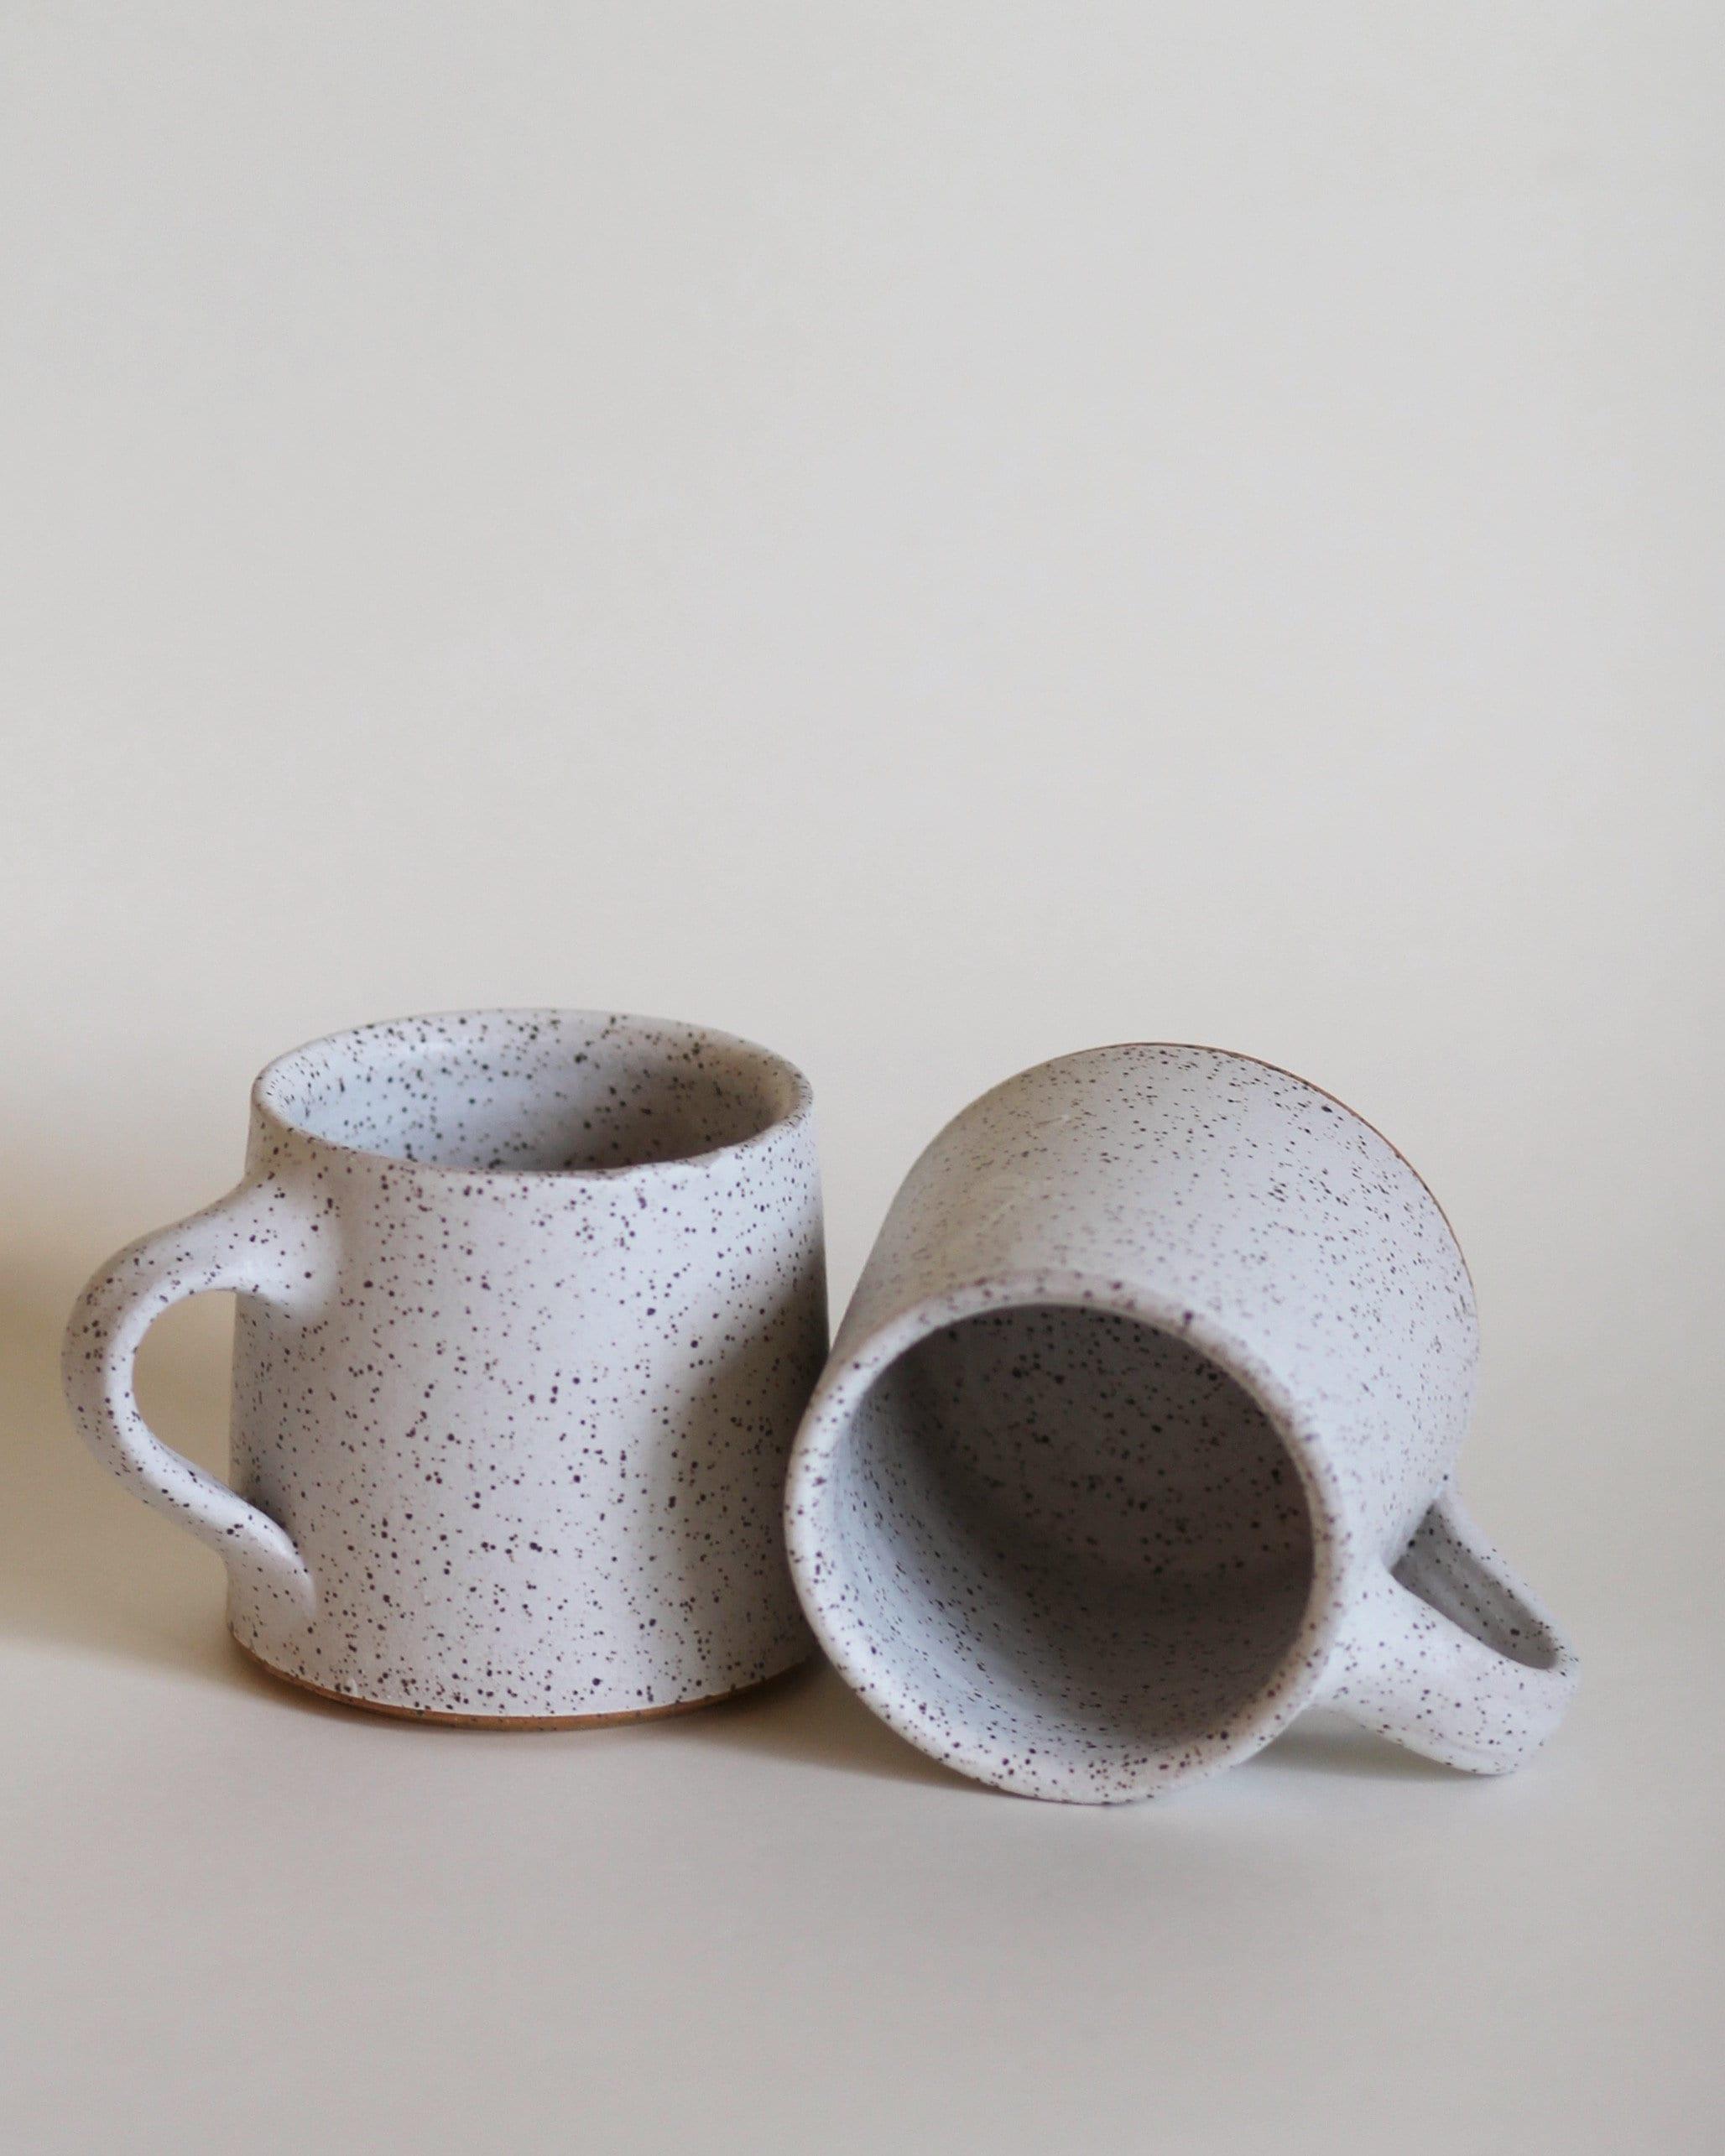 166b738e035 SET OF 2 white mugs, ceramic mug, coffee mug, tea mug, handmade mug, hand  thrown mug, white coffee mug, white mug, rustic mug